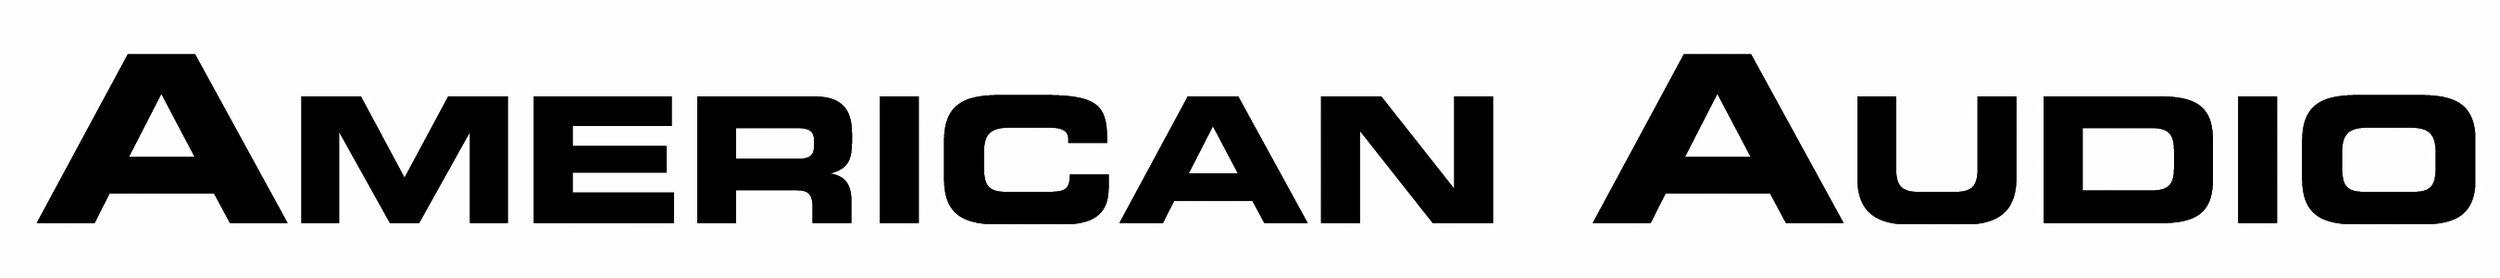 american-audio-logo.jpg